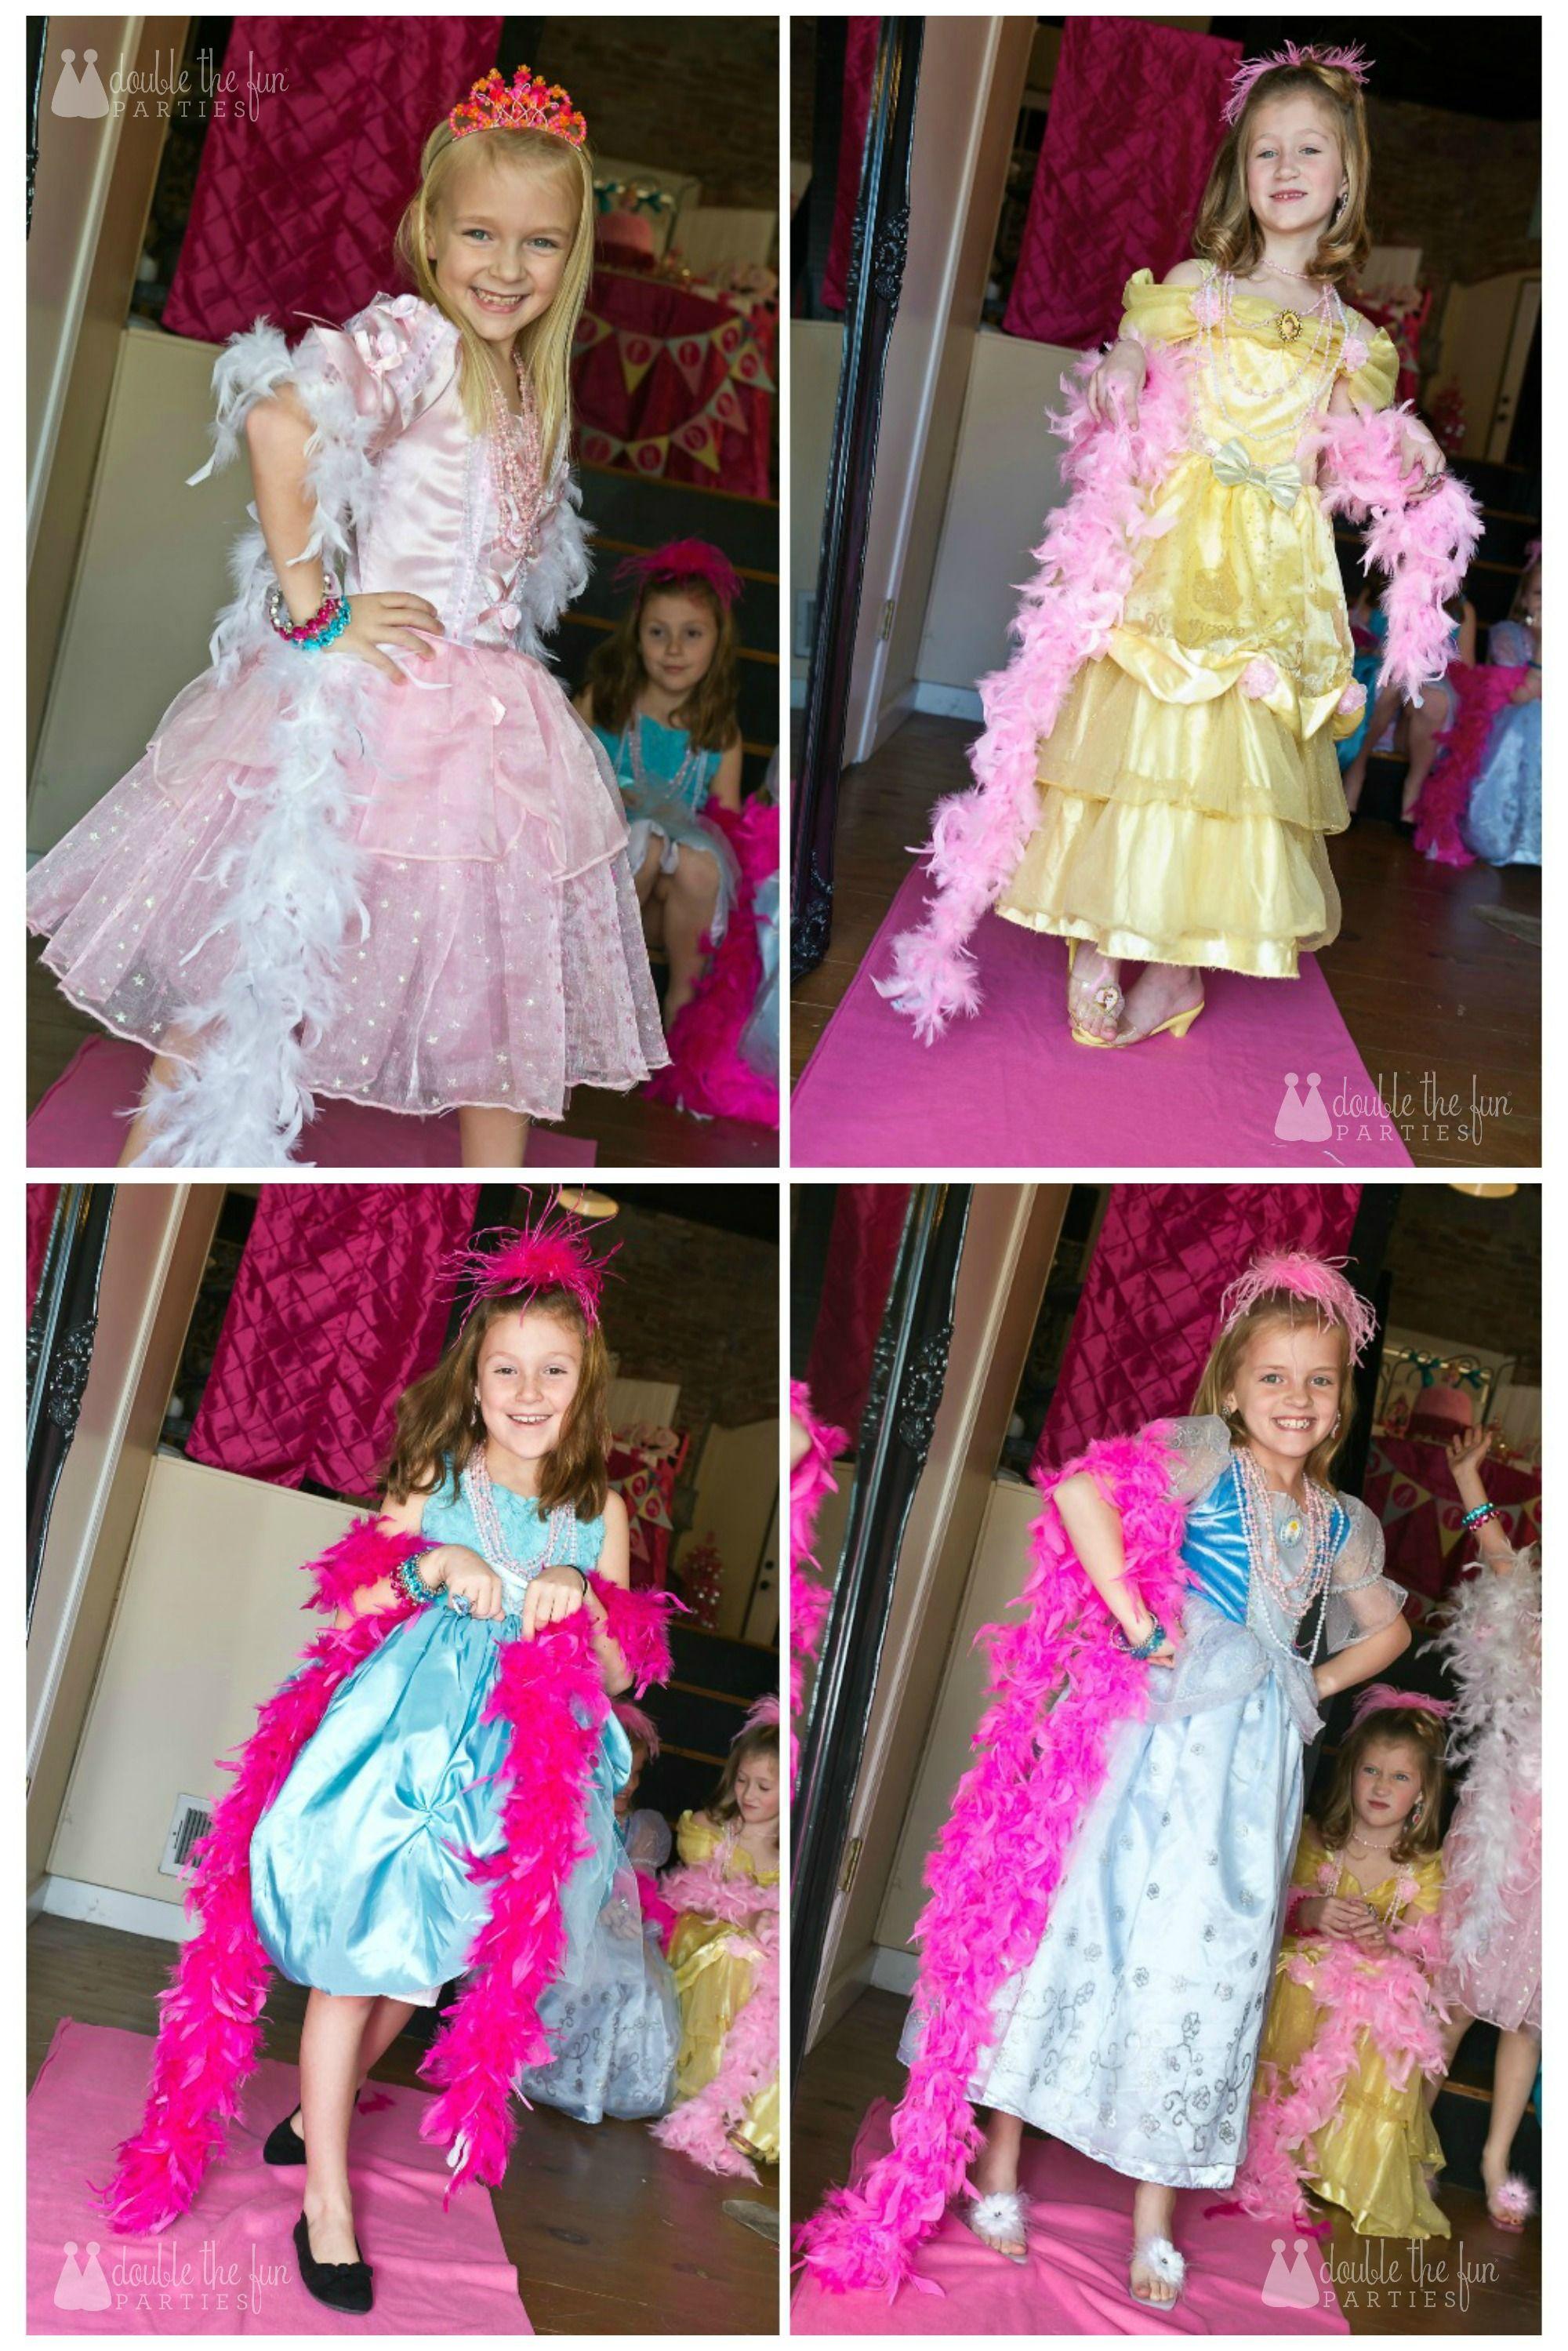 Fashion show dress up girl games